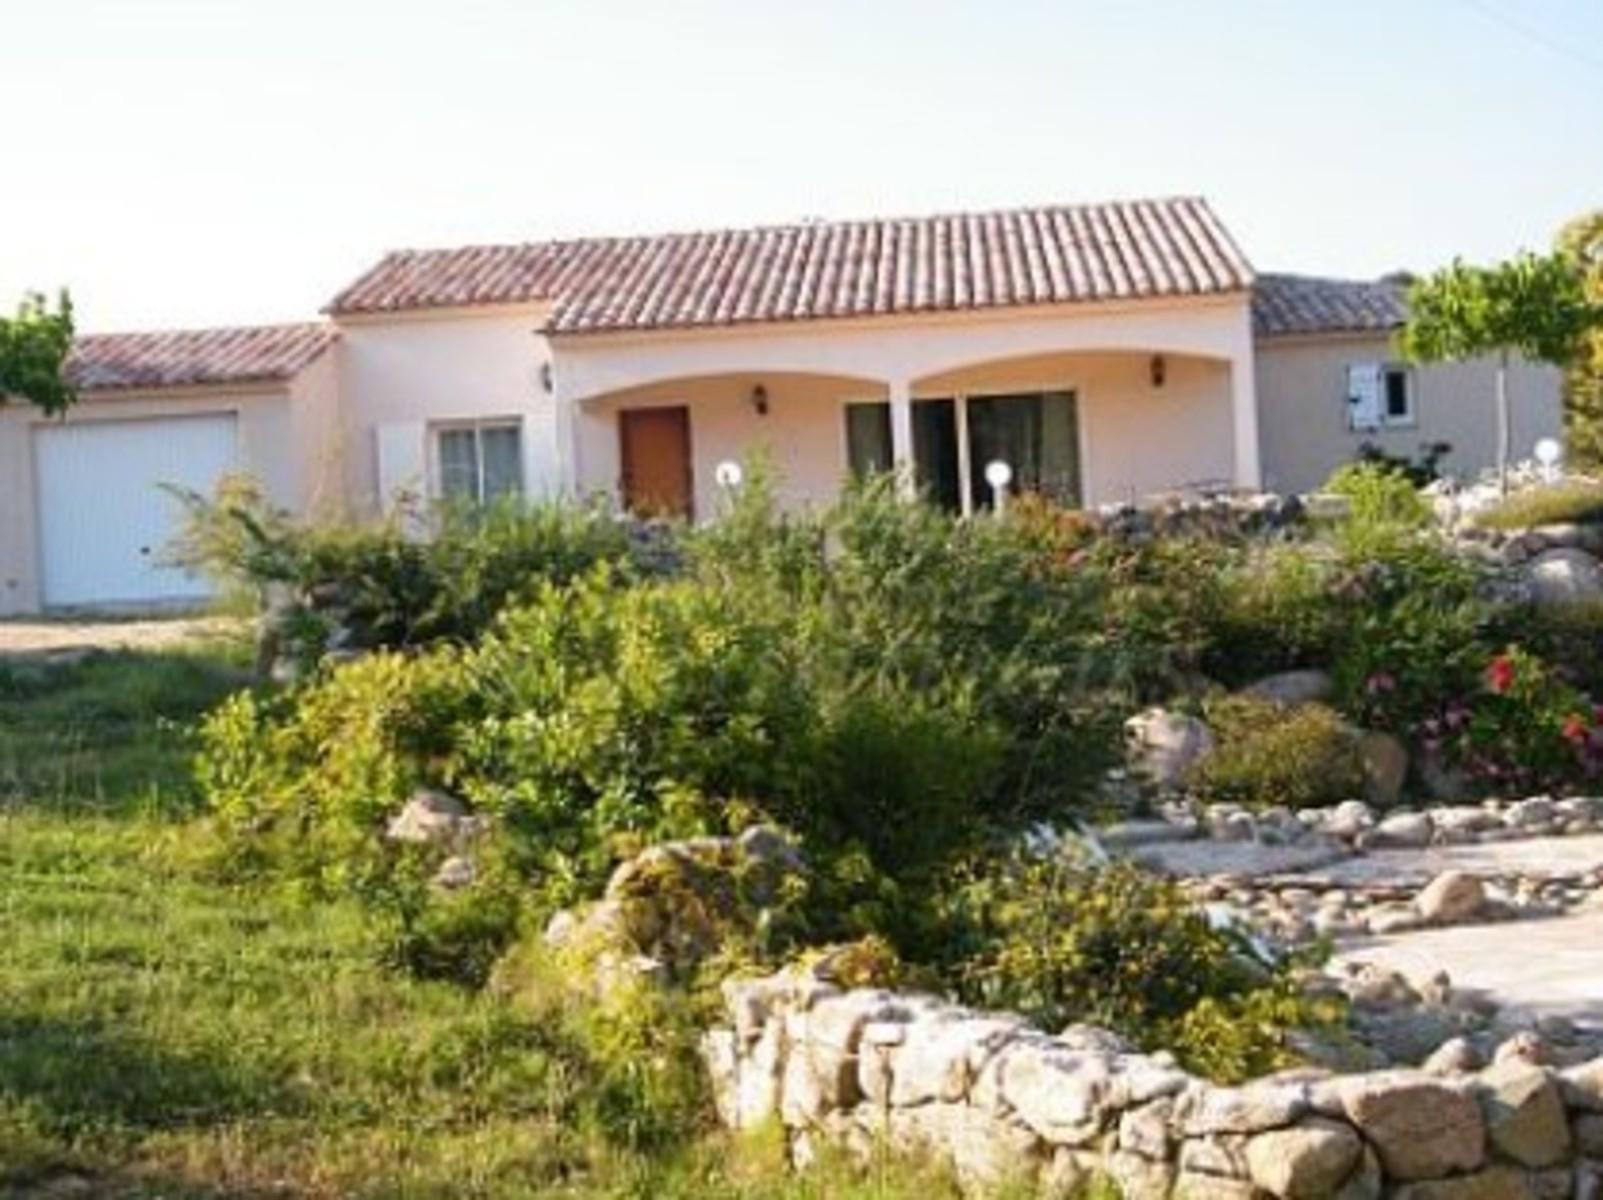 Villa Chera : Location De Vacances Sotta, Corse-Du-Sud destiné Chambre D Hotes Corse Du Sud